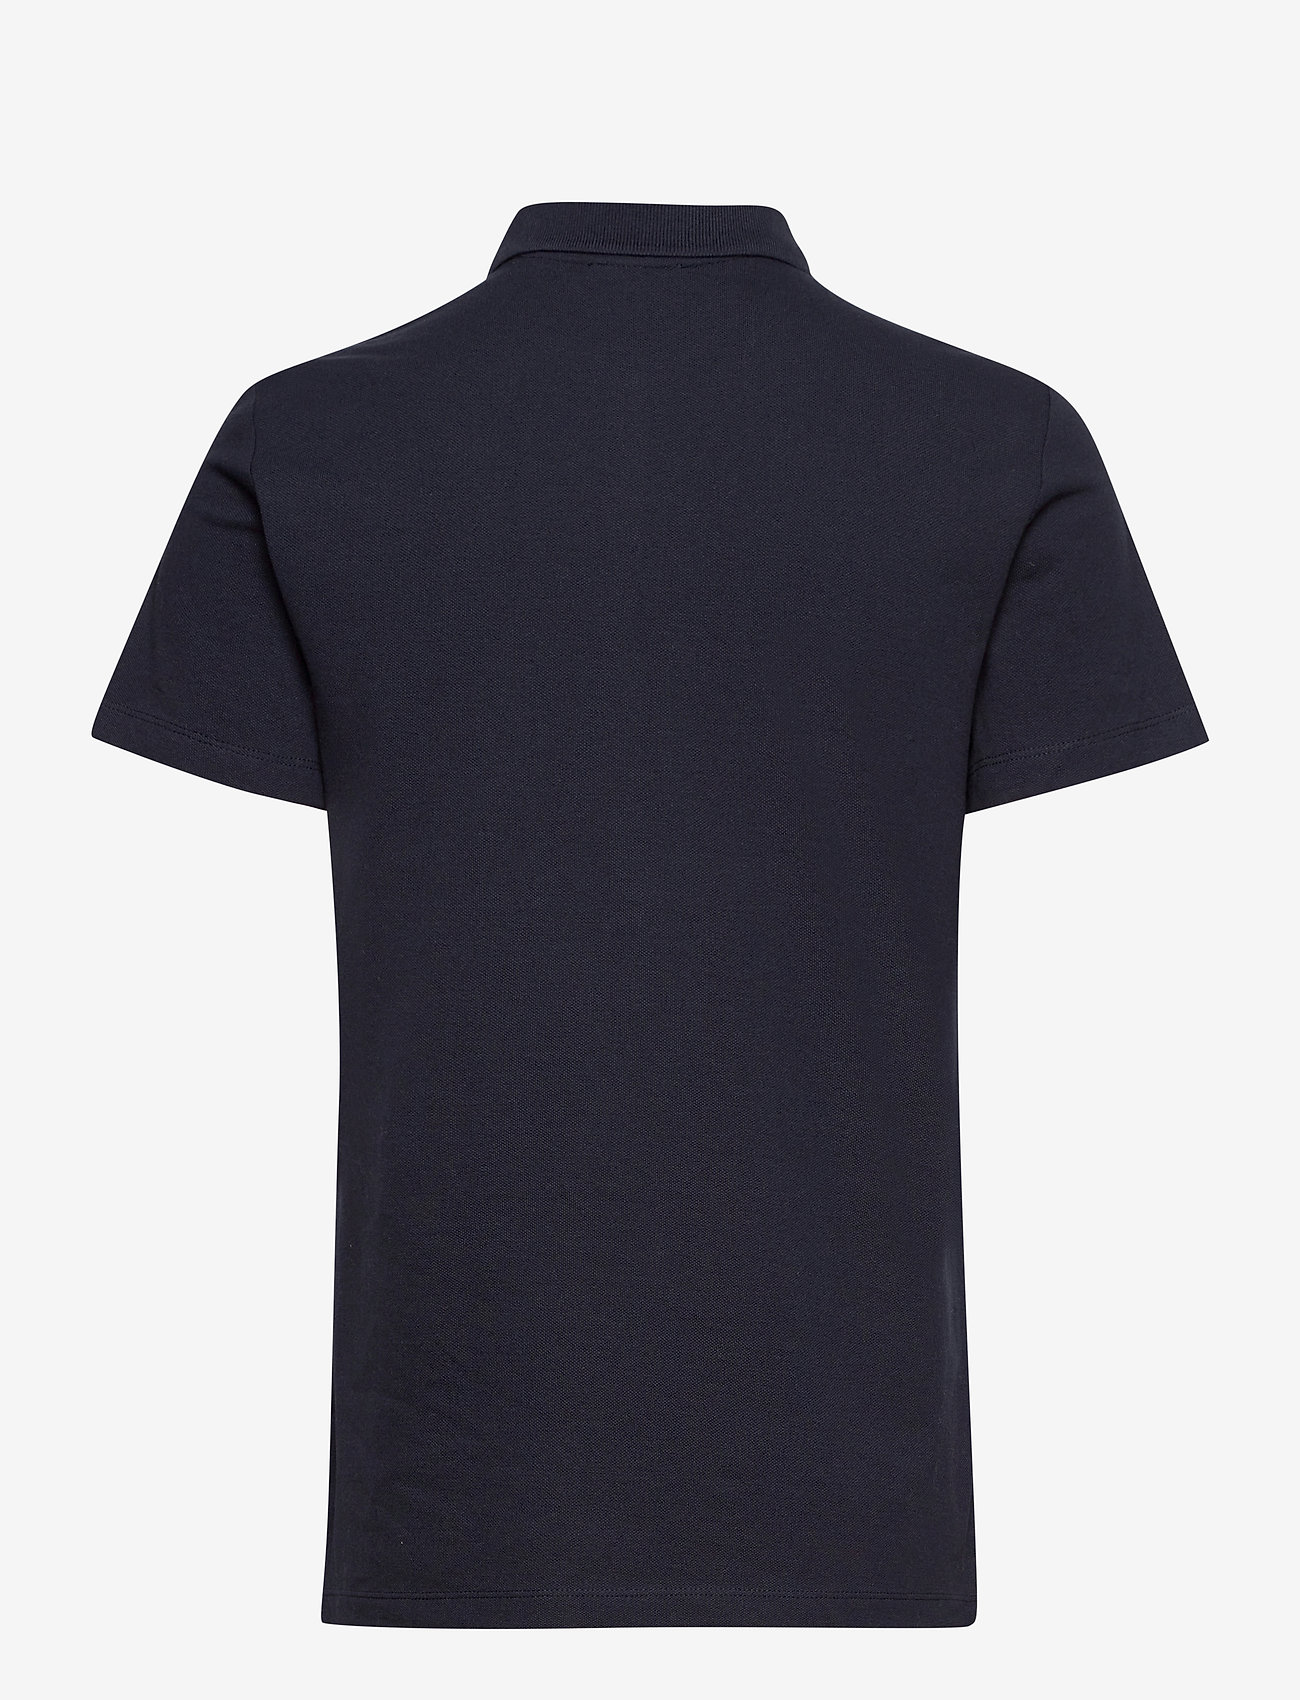 Esprit Casual - T-Shirts - polohemden - navy - 1